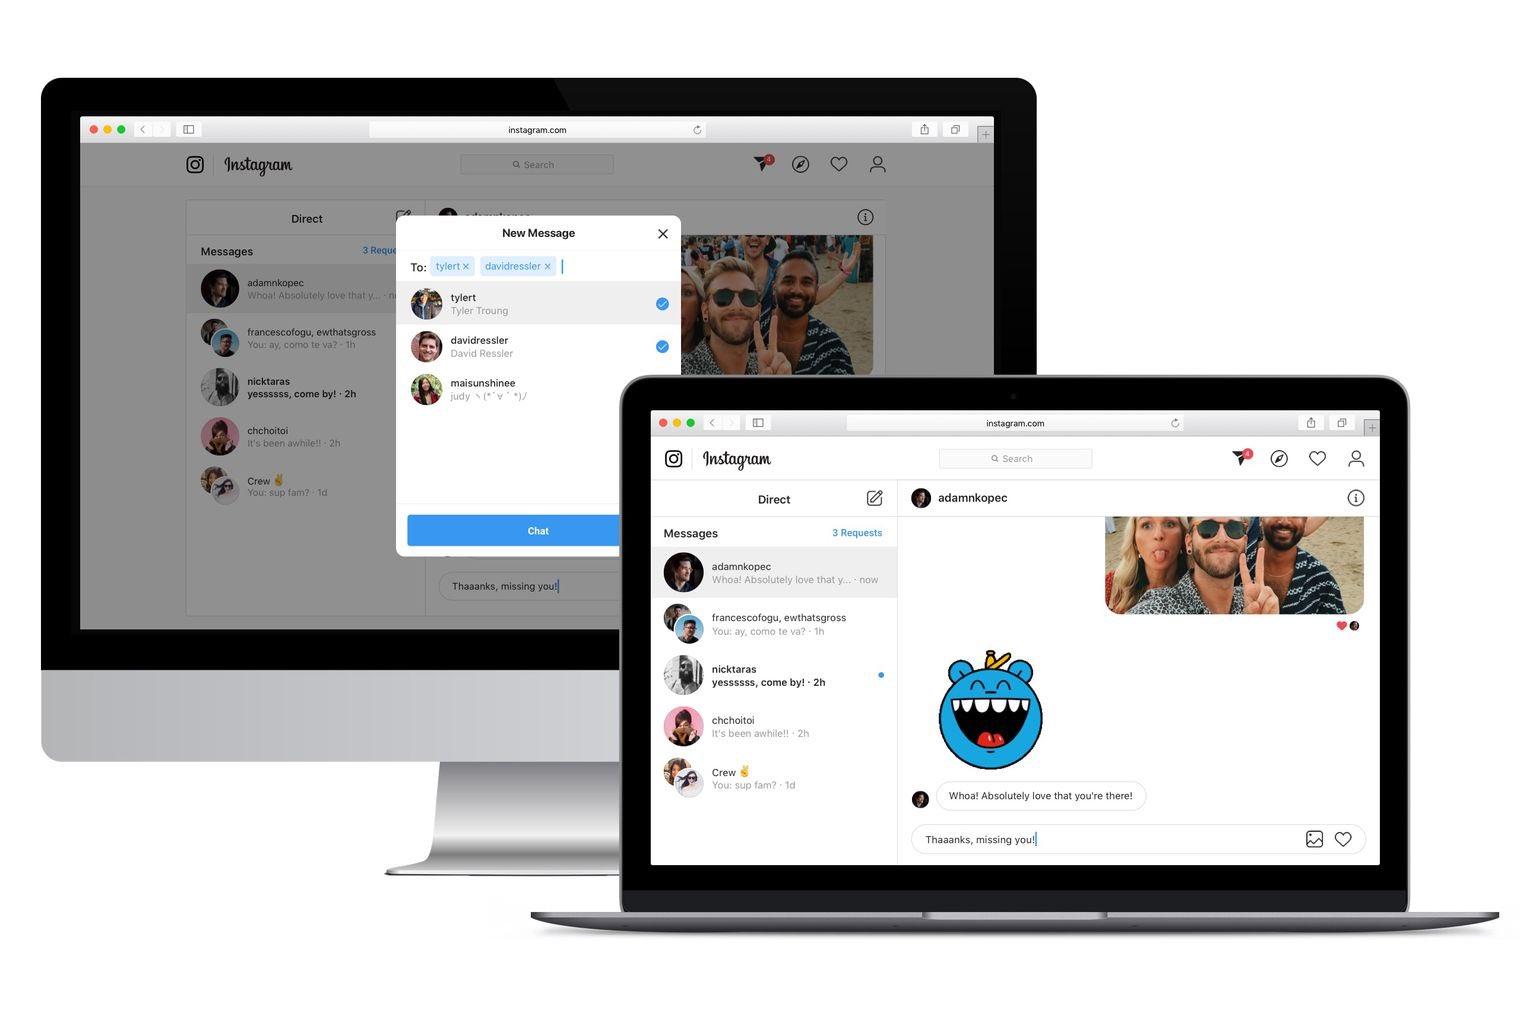 instagram pronto permitirá enviar mensajes privados